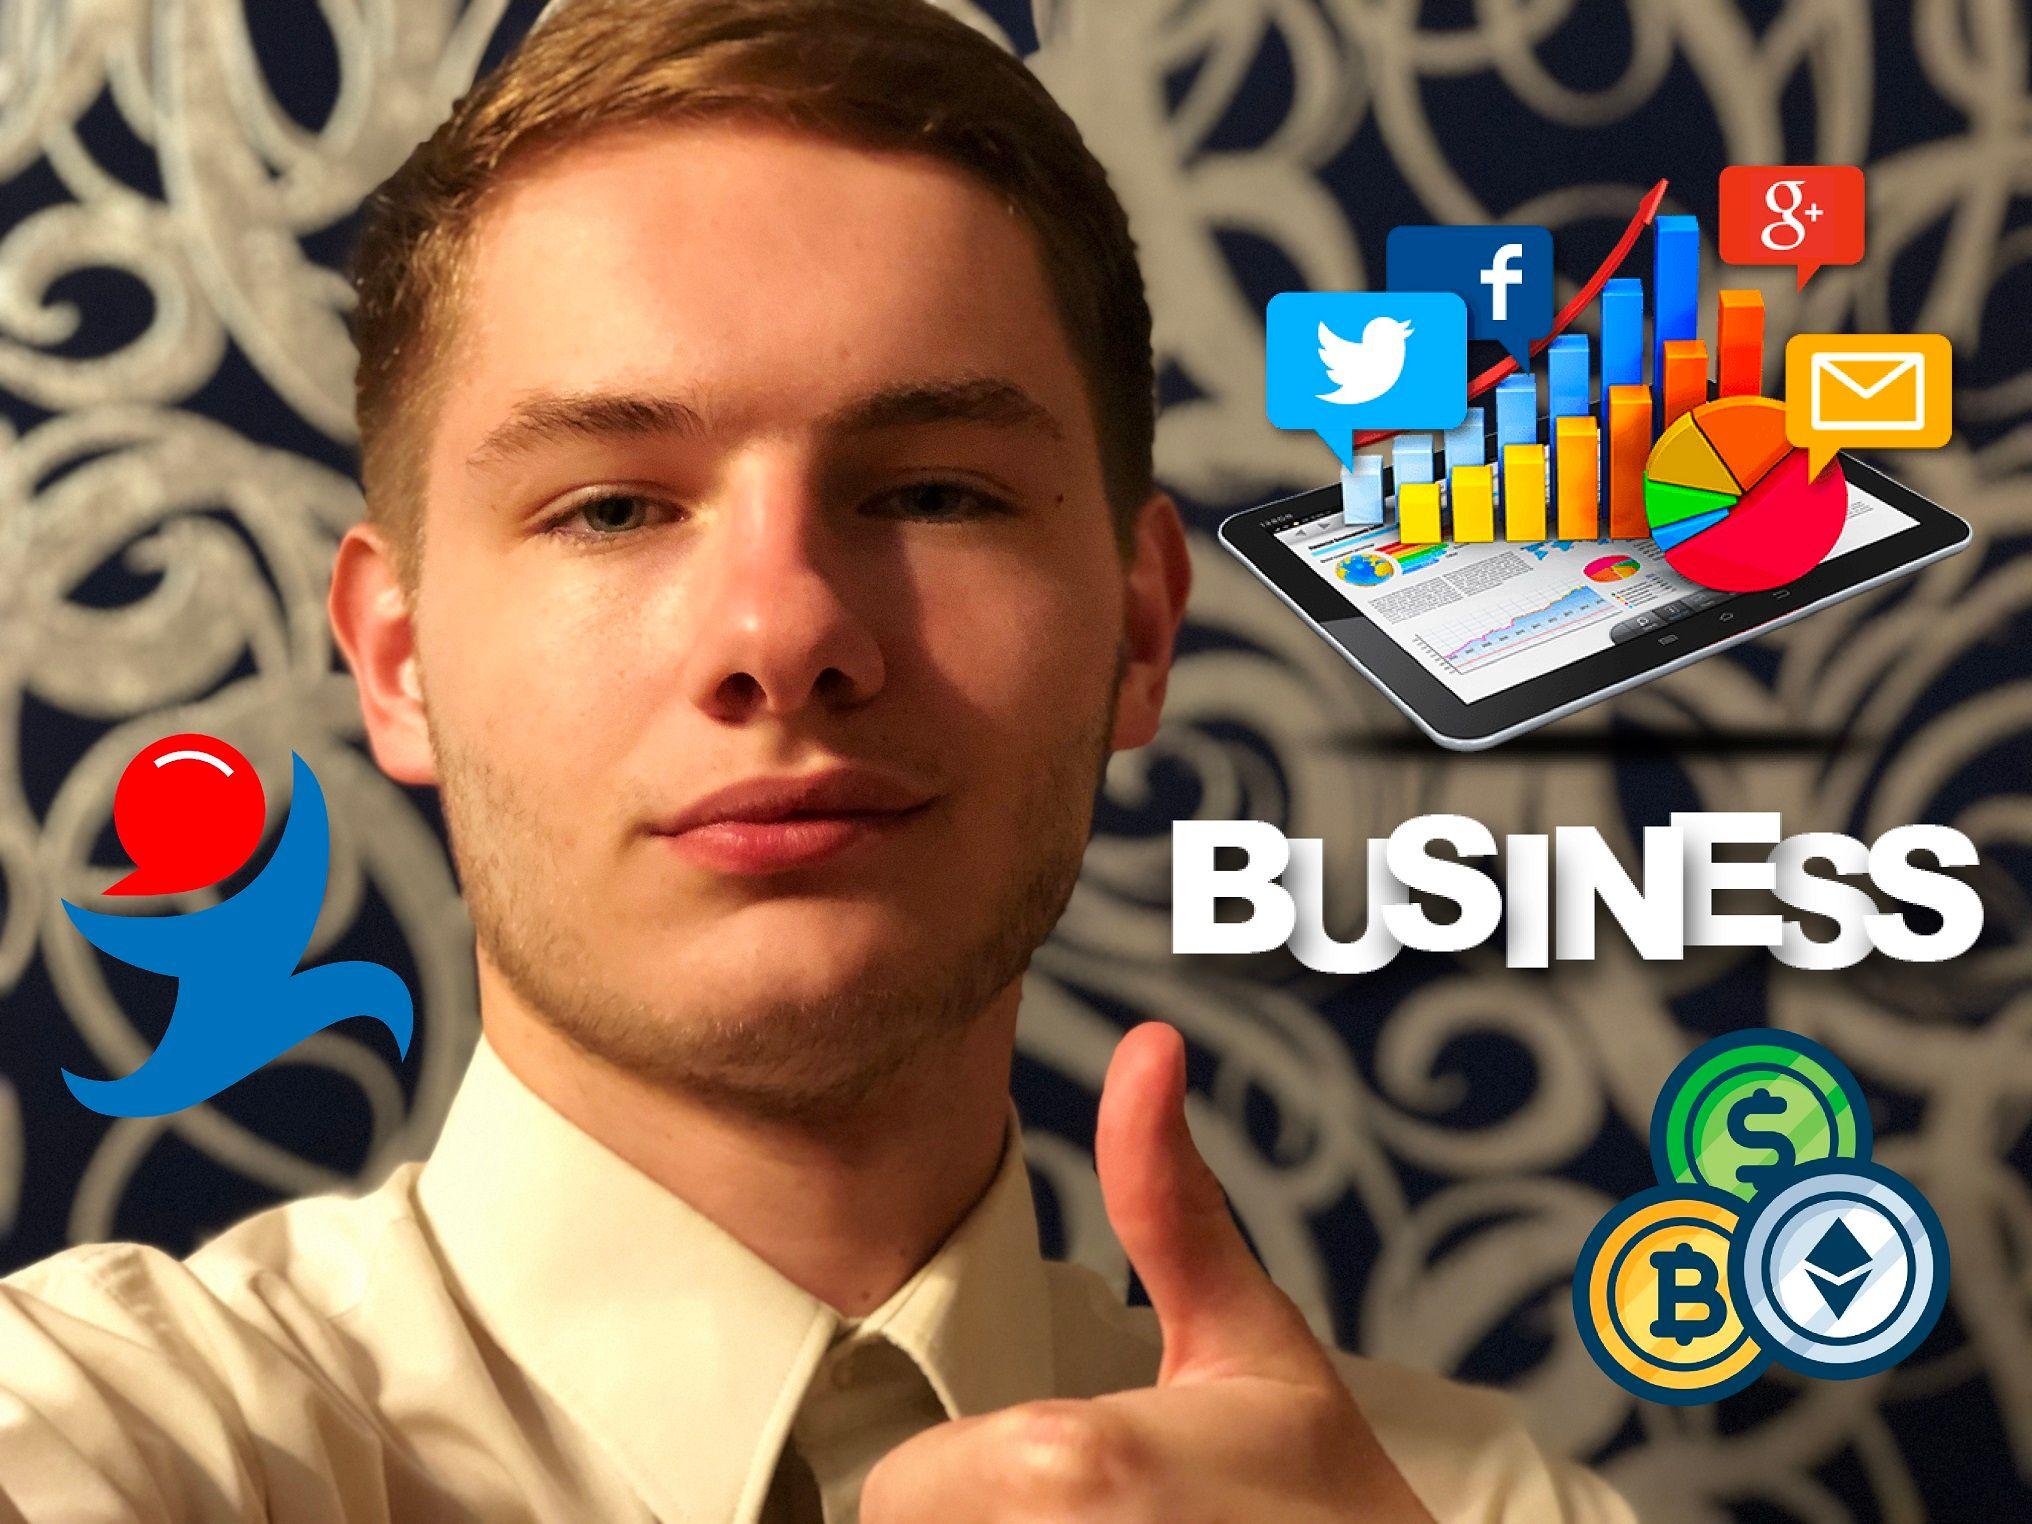 бизнес блог.jpg